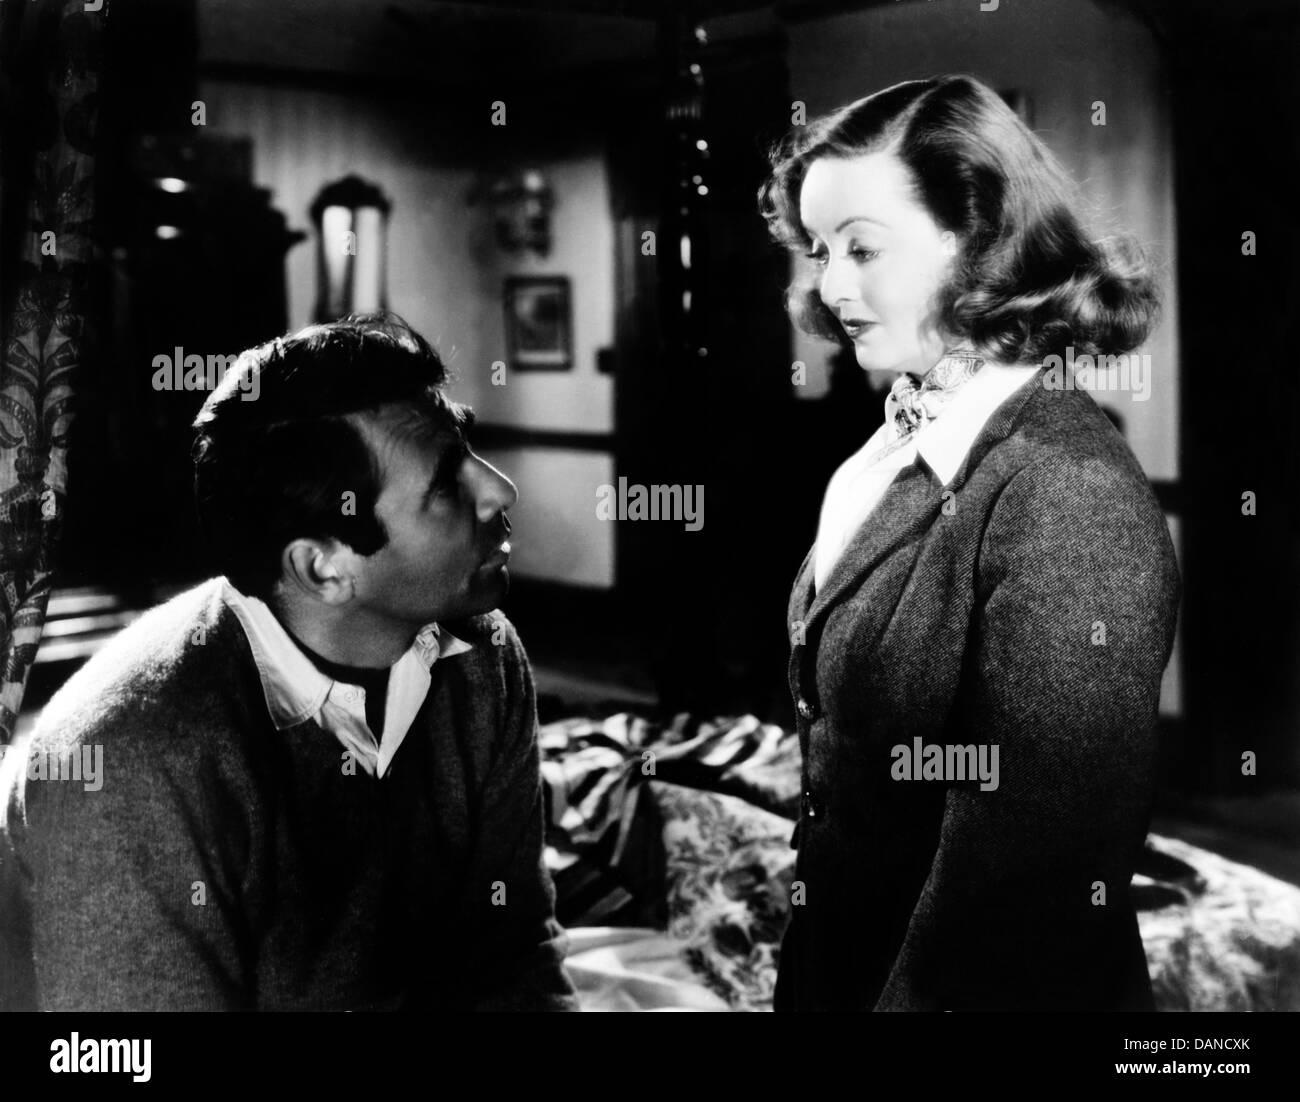 ANOTHER MAN'S POISON (1951) GARY MERRILL, BETTE DAVIS, IRVING RAPPER (DIR) AMPN 001 MOVIESTORE COLLECTION LTD - Stock Image